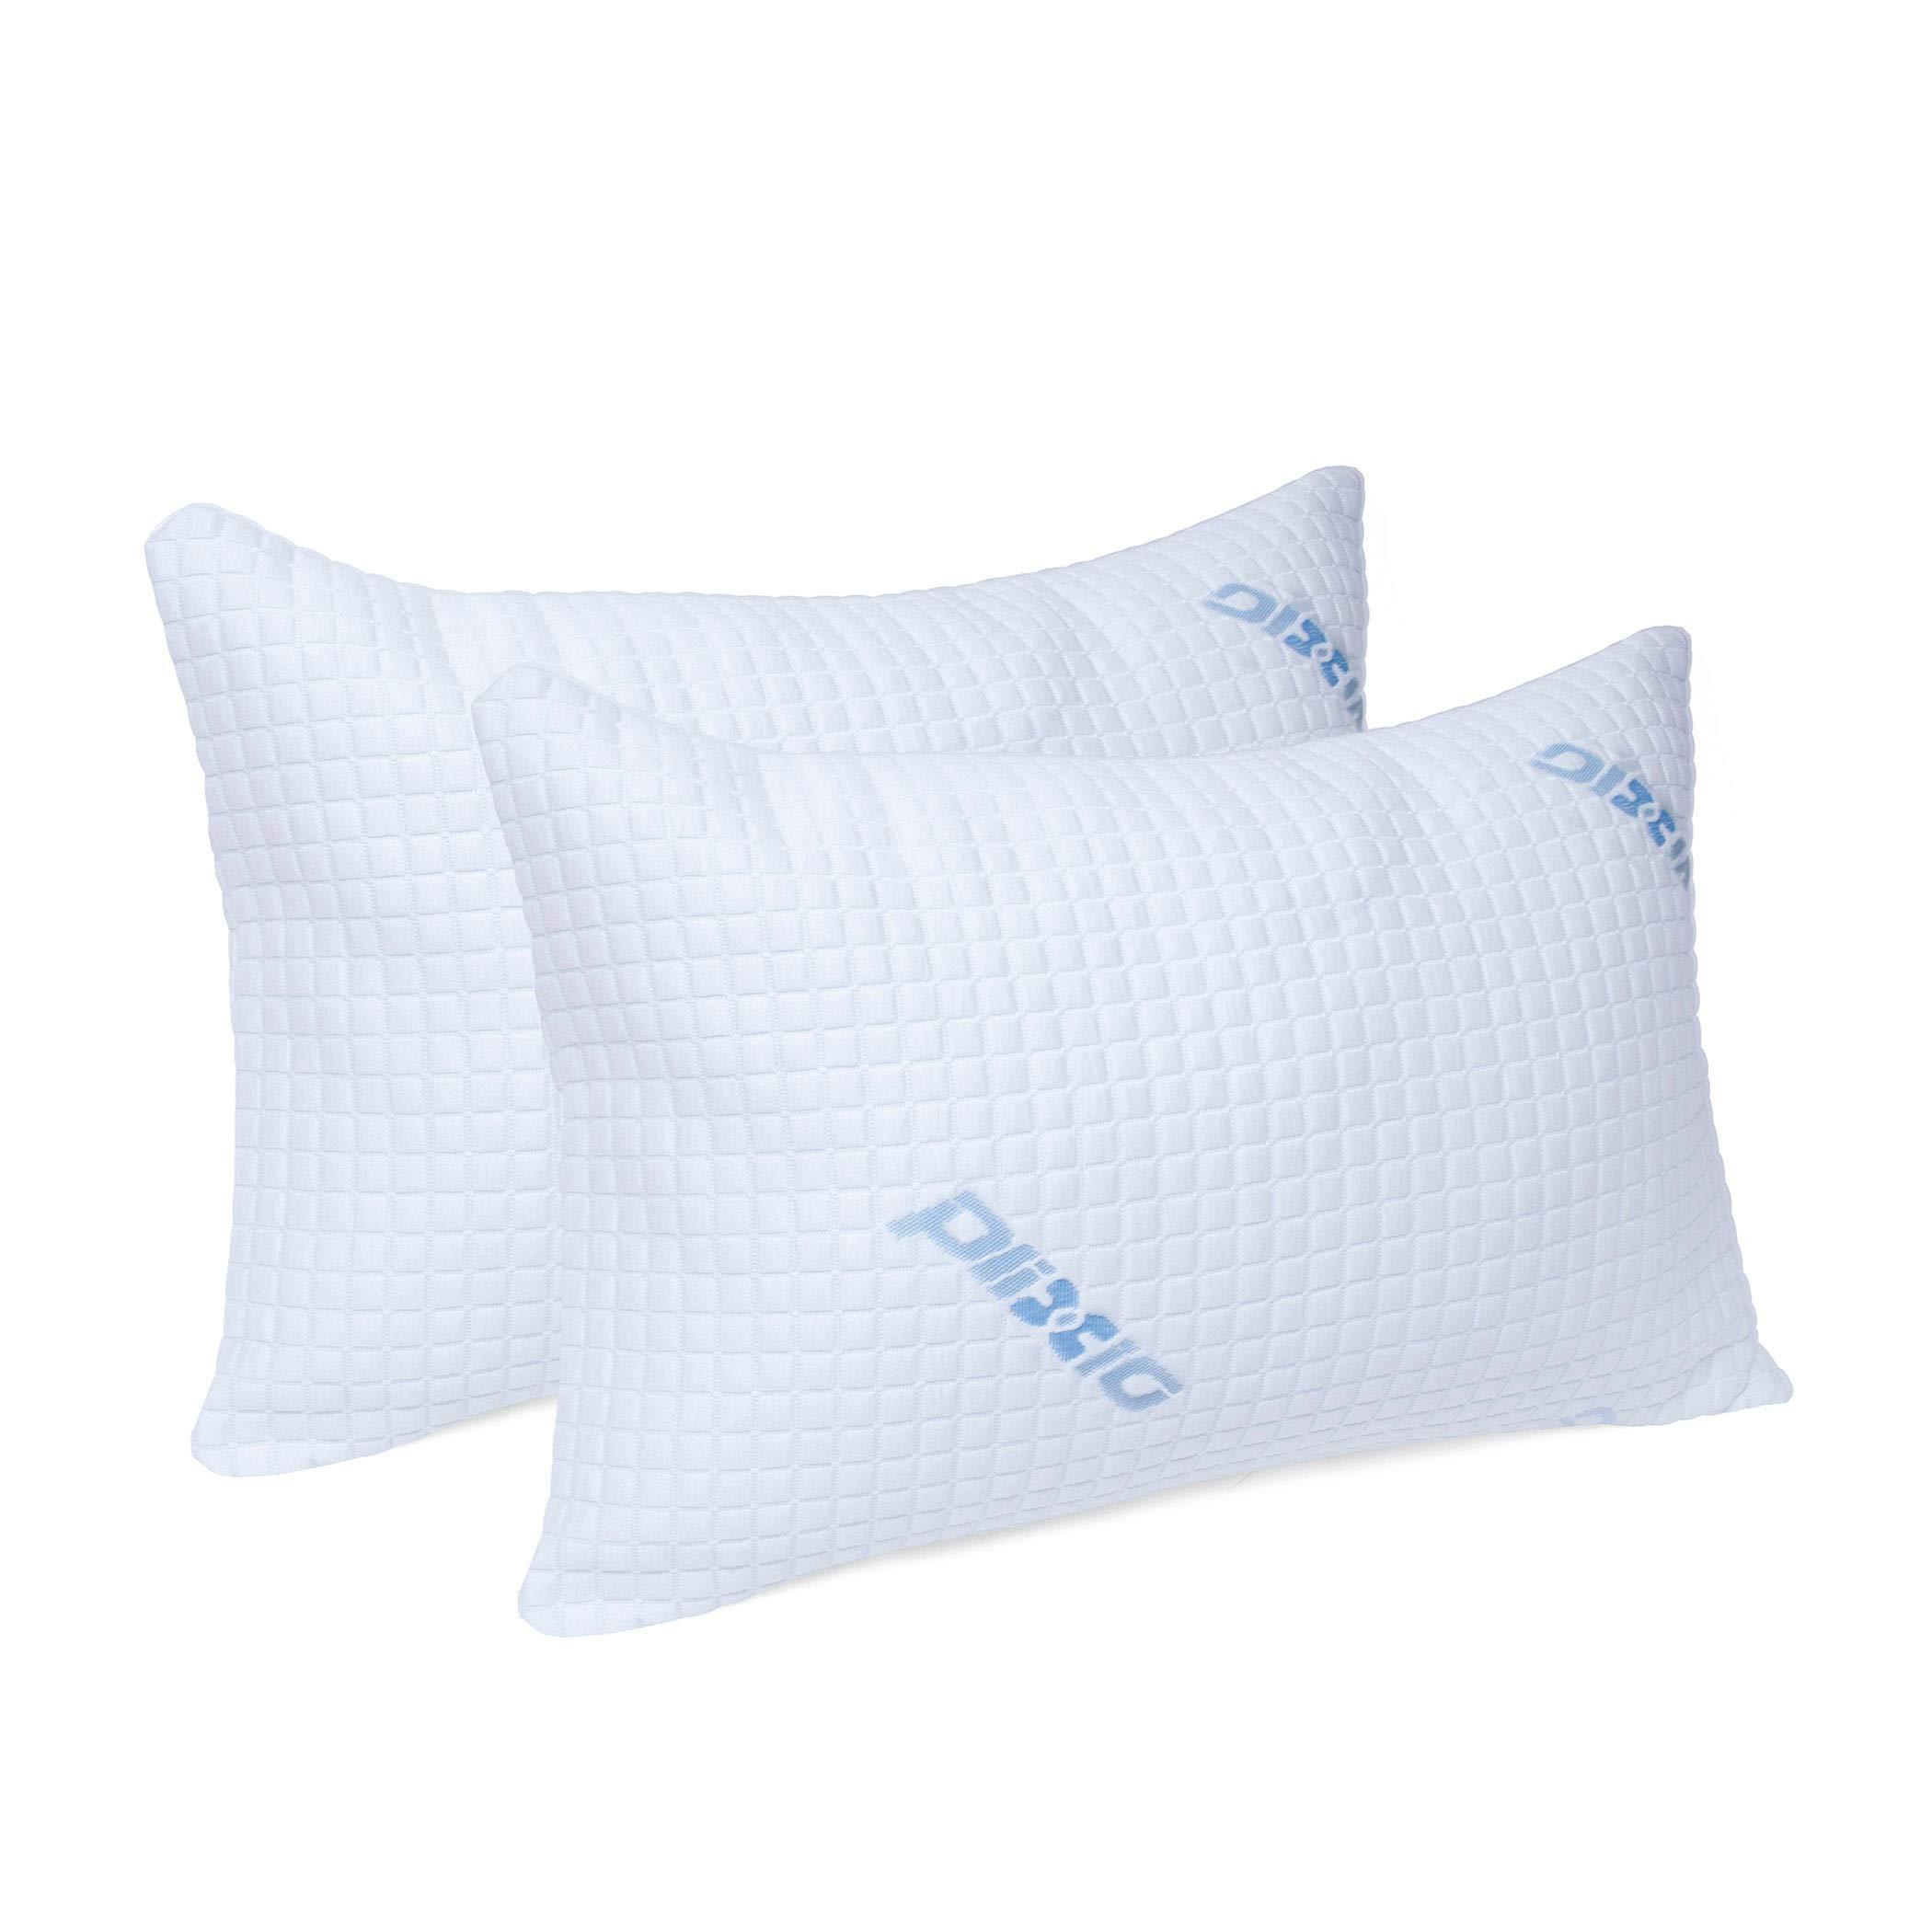 Plixio Deluxe Shredded Memory Foam Pillow 2 Pack Queen With